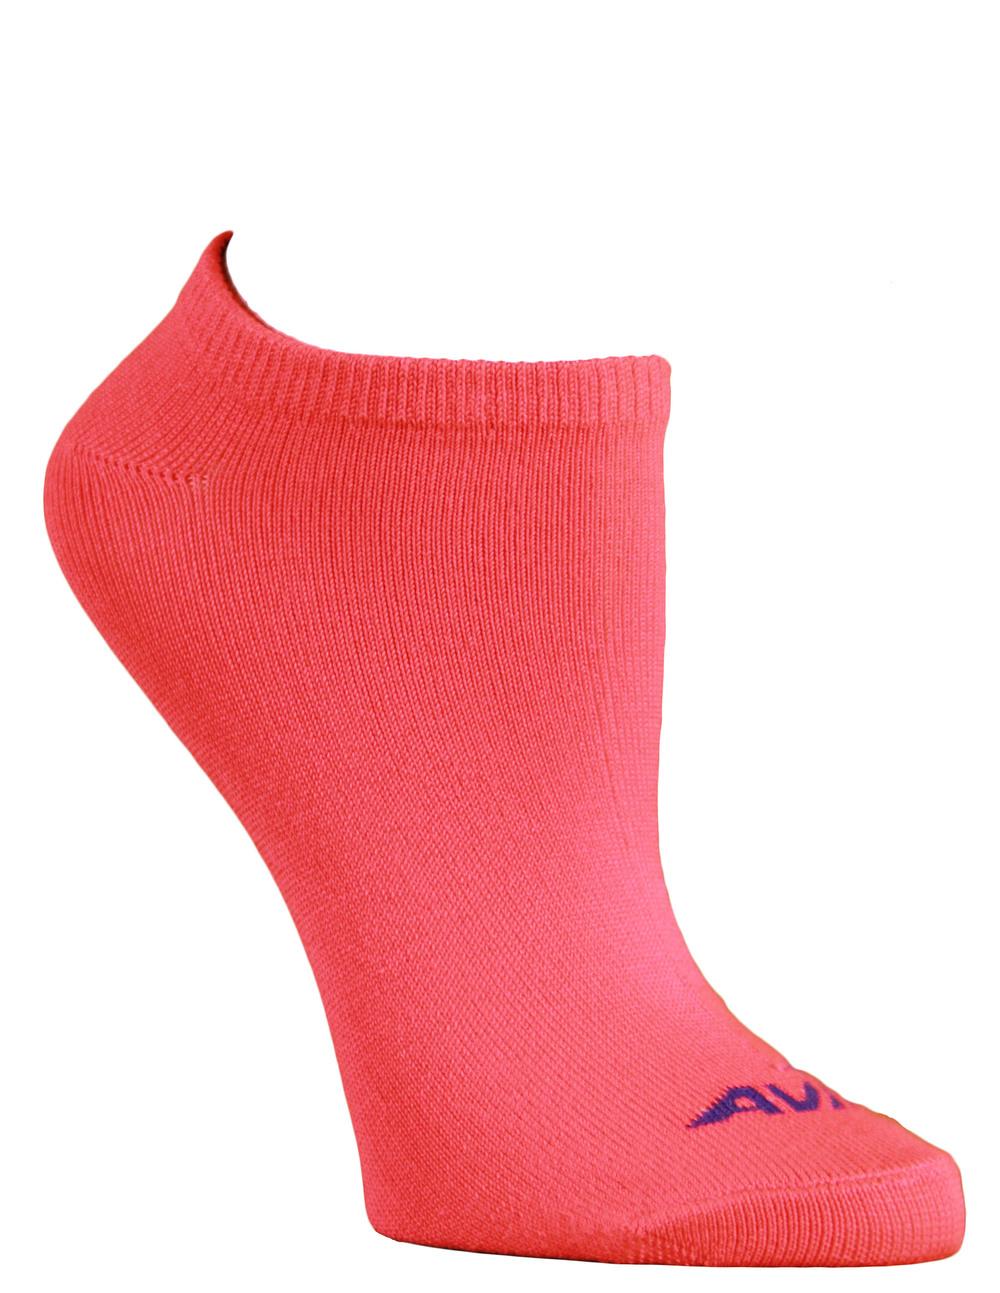 662-sock.jpg